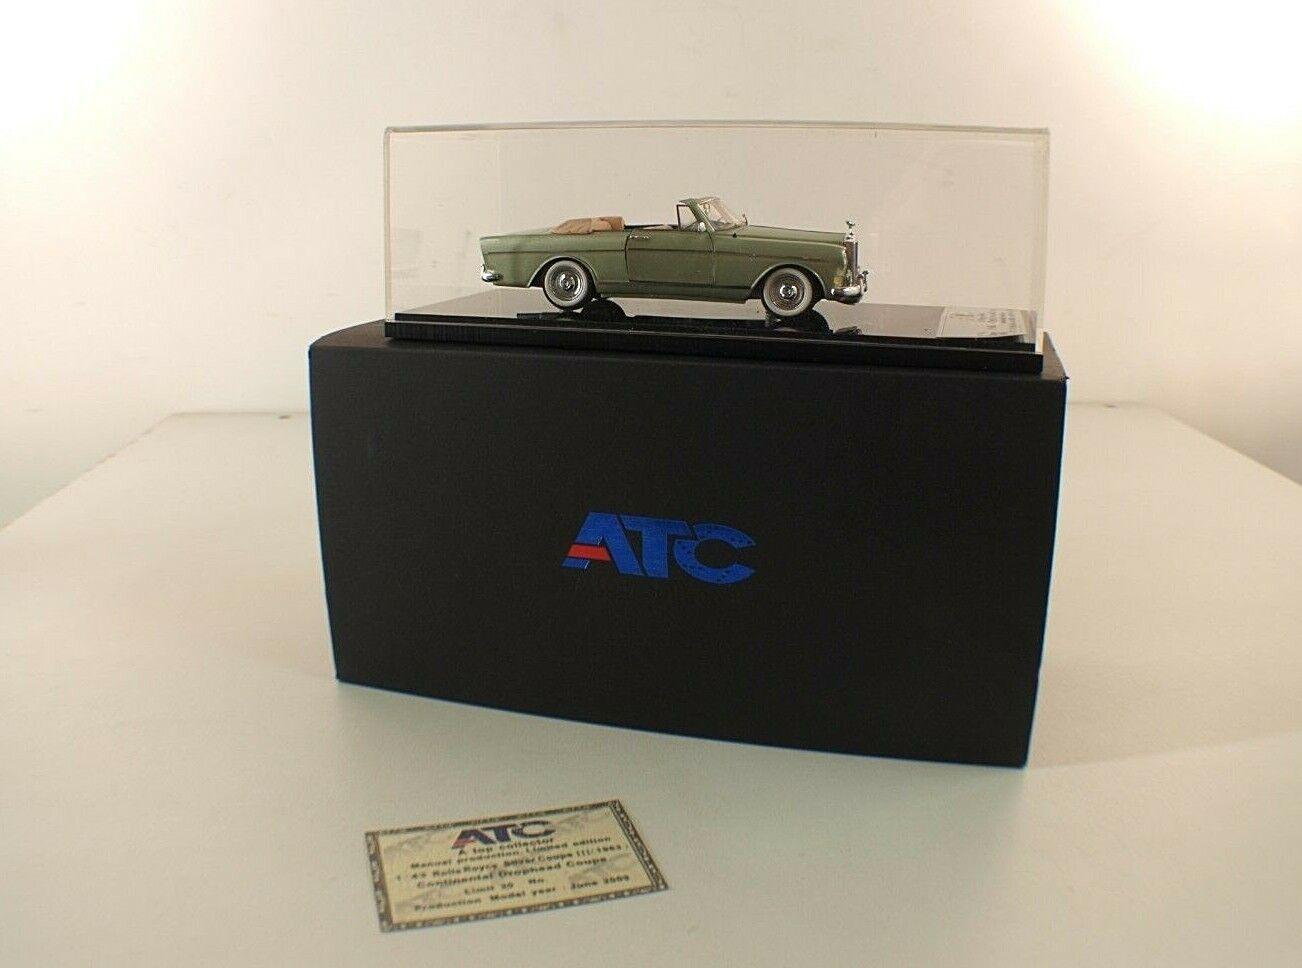 ATC Model  Collectibles - 1964 Rolls Royce Cloud III H.J Mulliner - 1 43